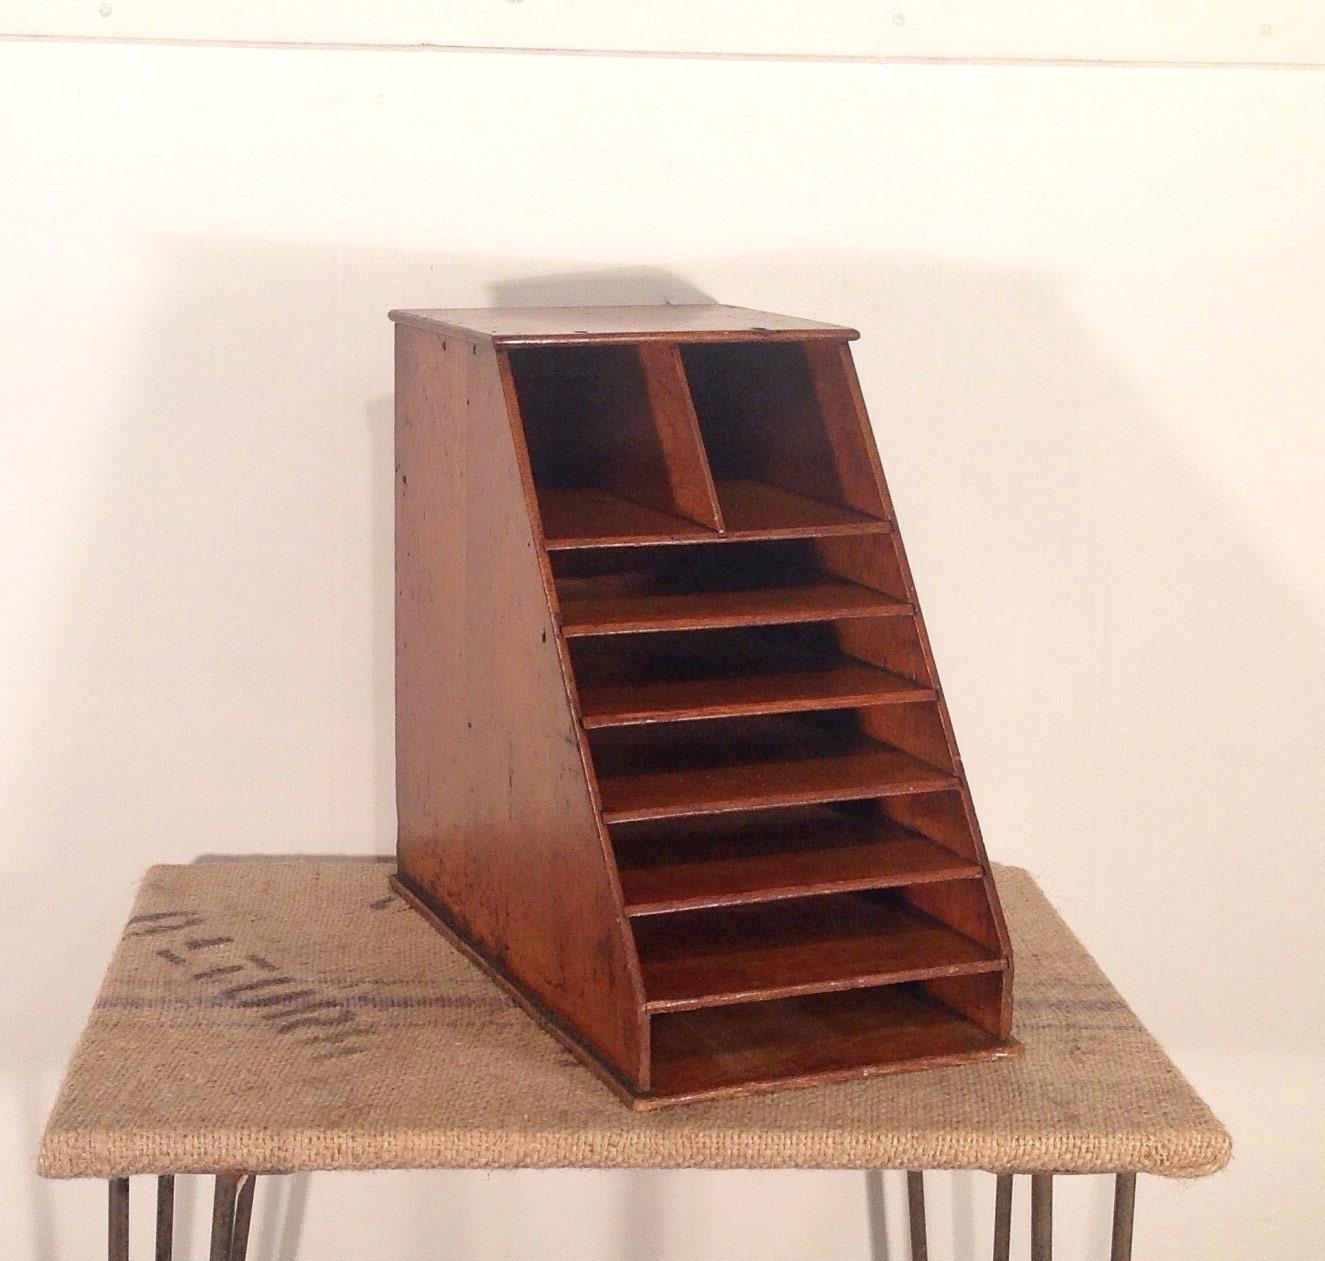 Lastest MyGift Cabinet Shelf Vintage Desktop Wood Storage Office Organizer